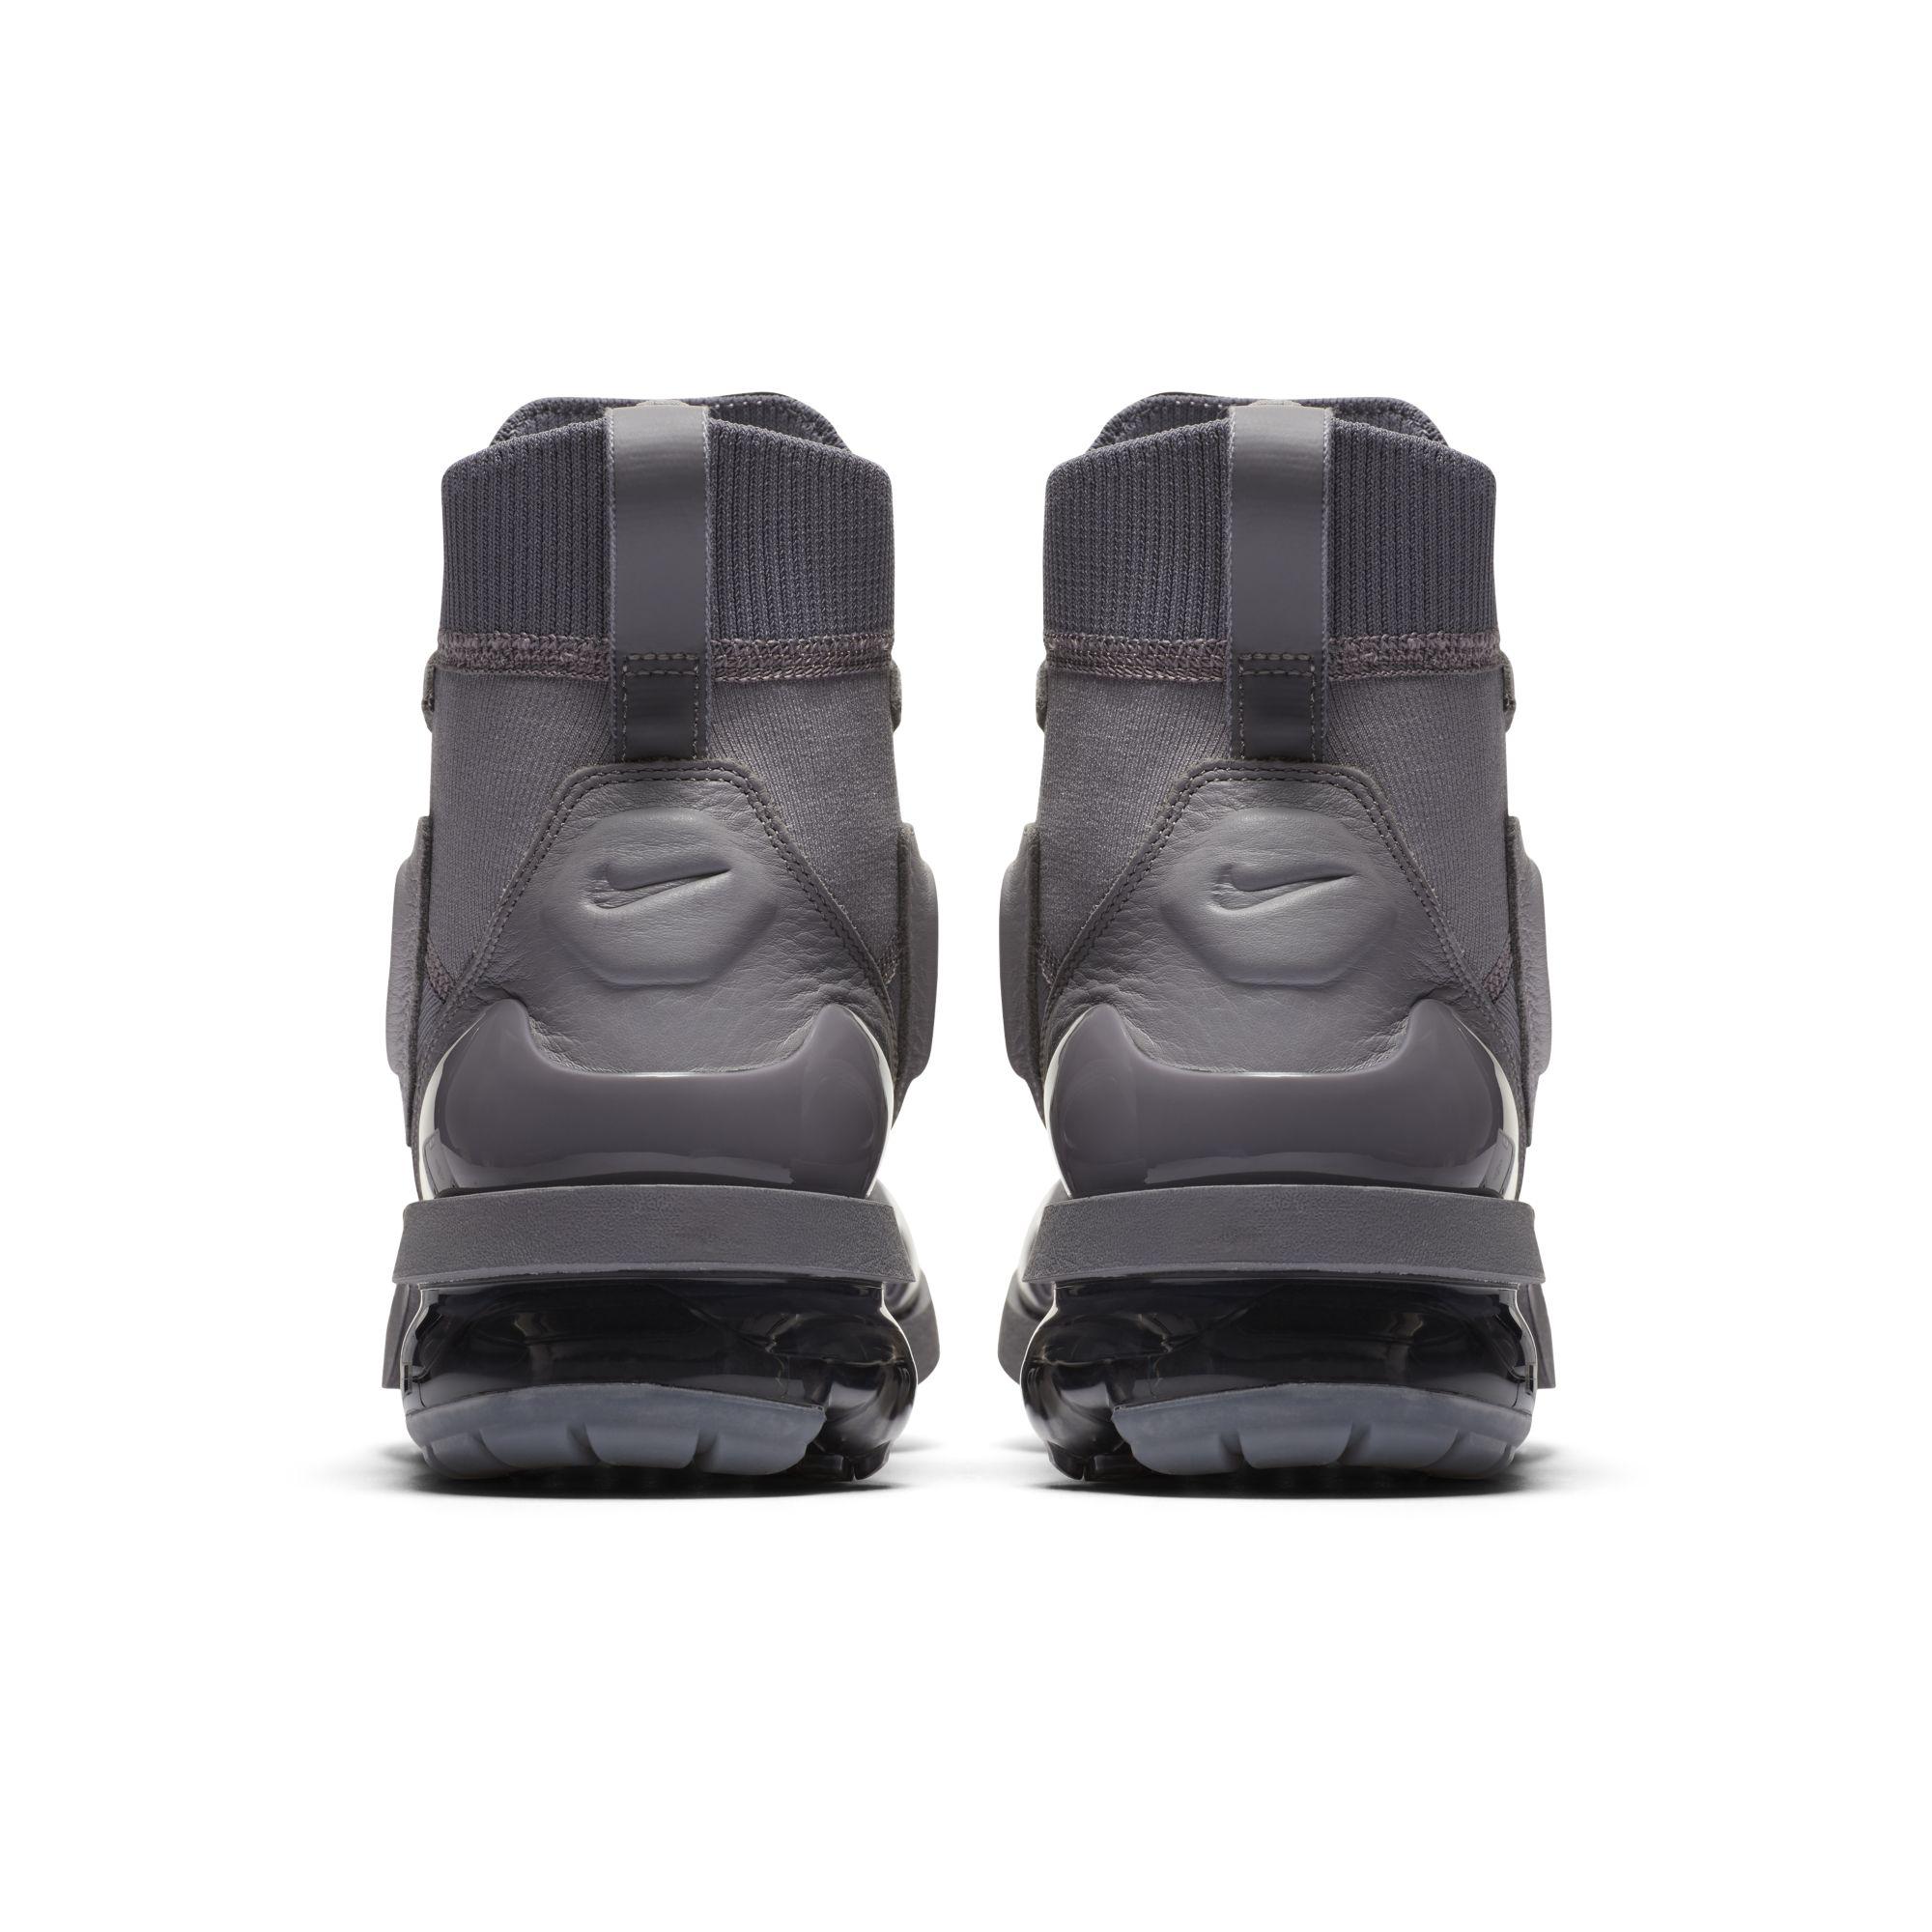 559cfe2319d nike air vapormax light 2 boot heel - WearTesters